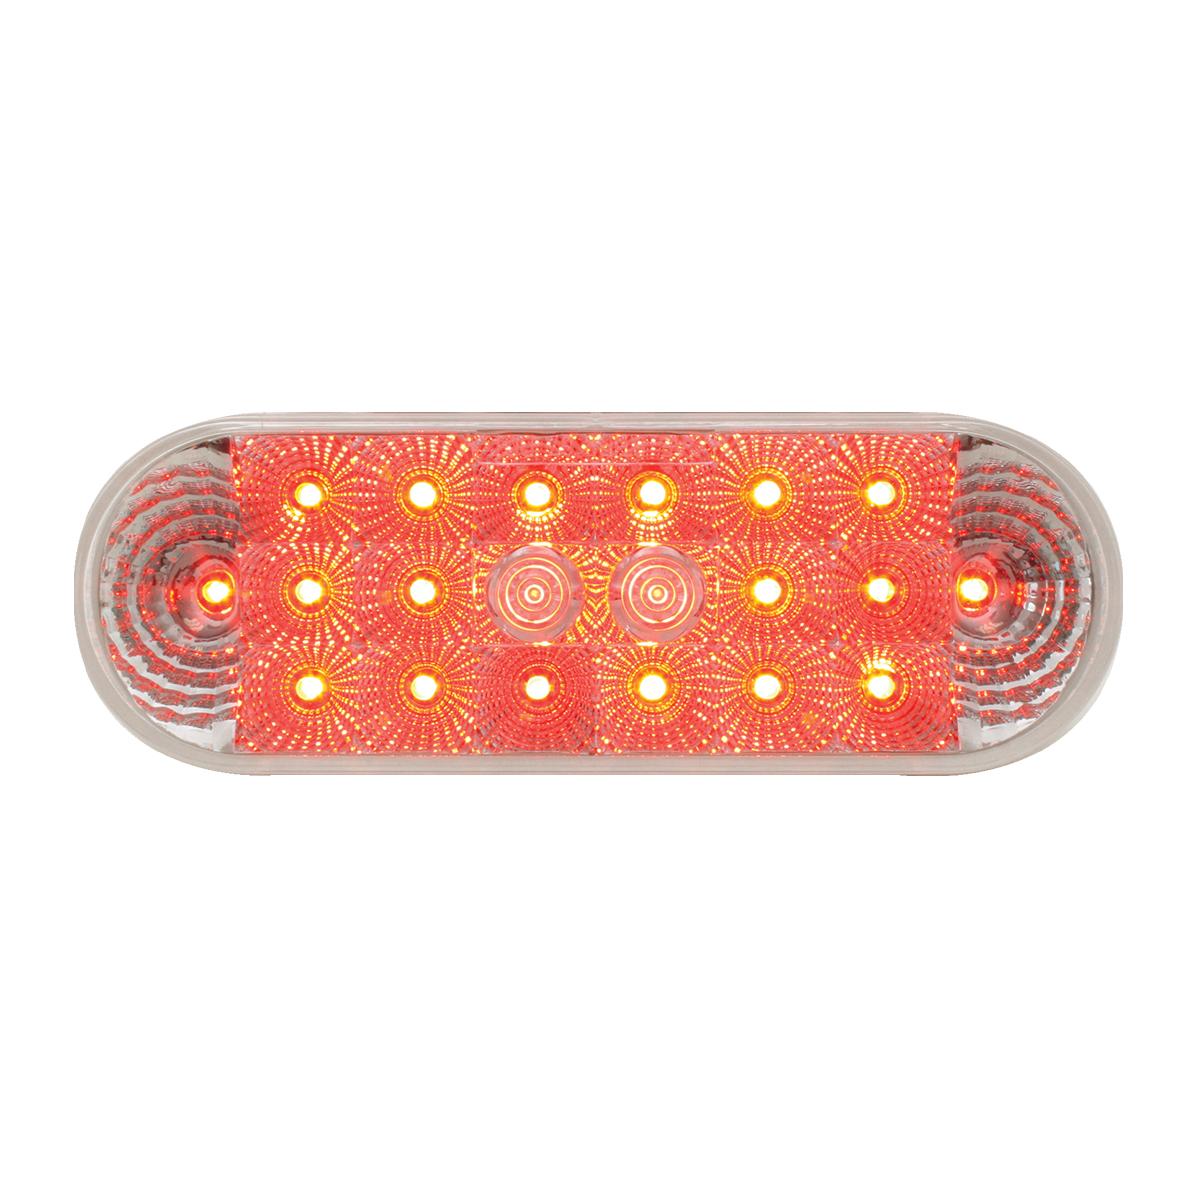 #77054 - Oval Spyder LED Flat Red/Clear Light - Slanted